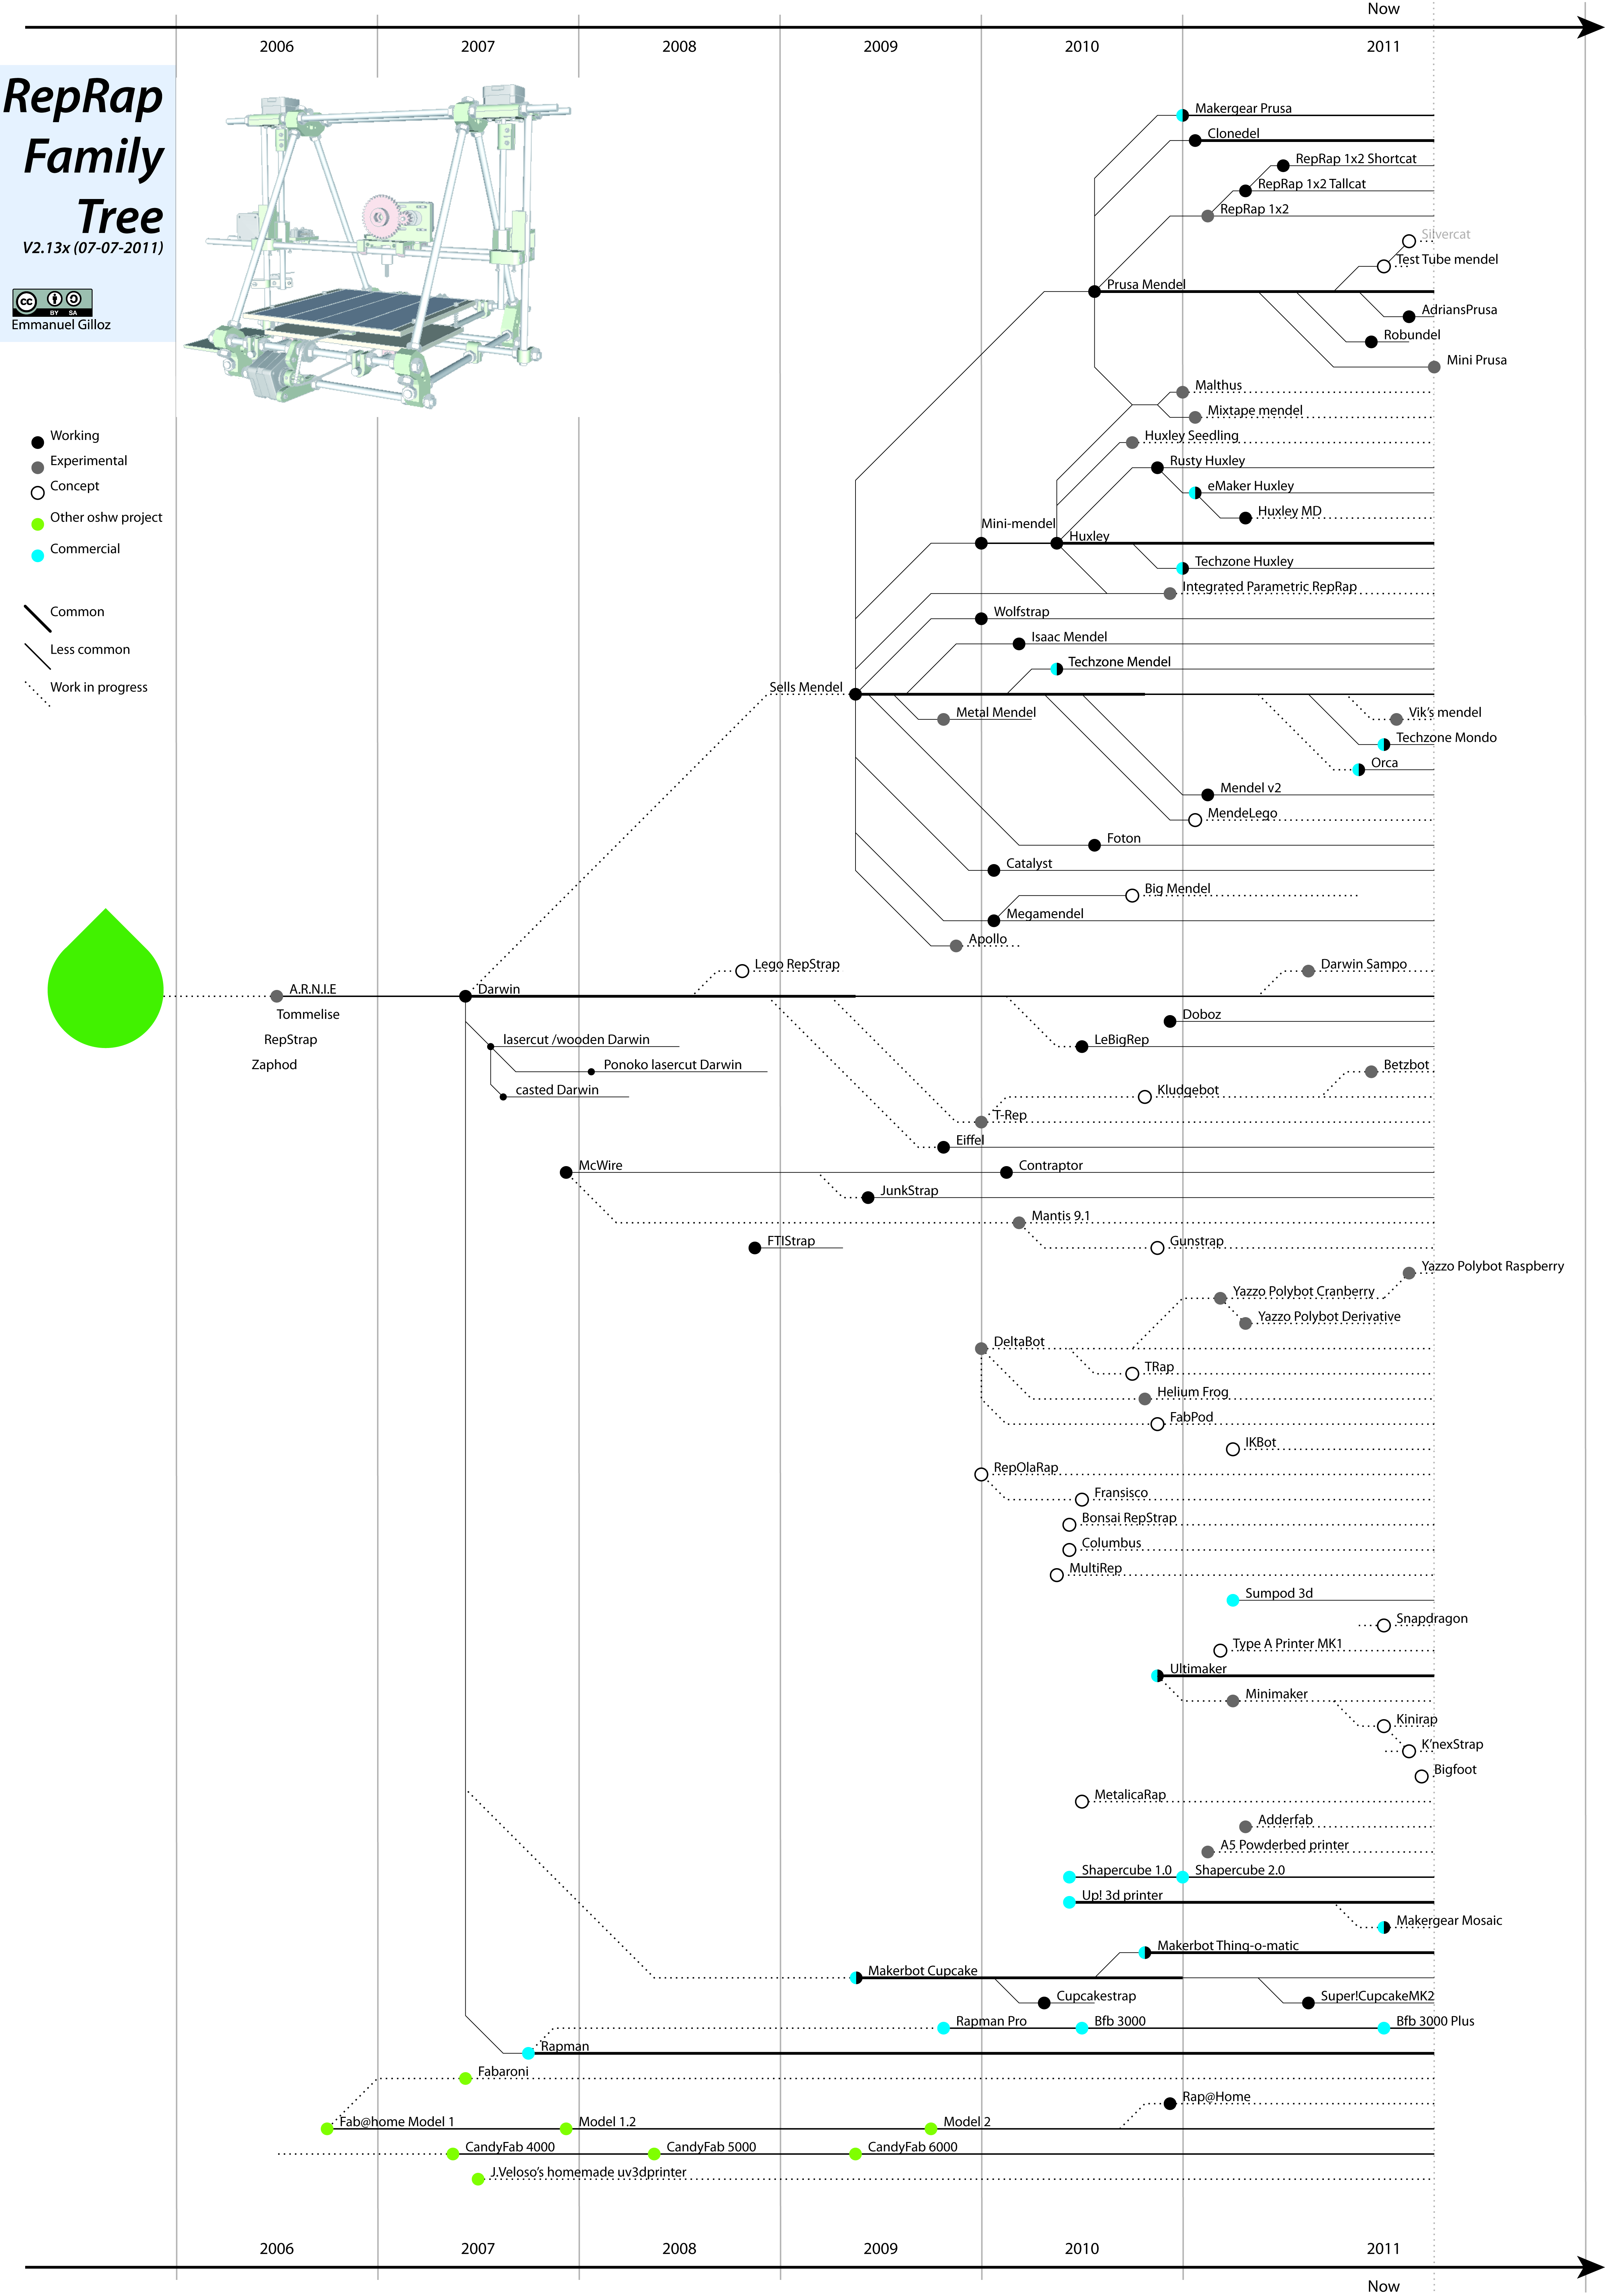 reprap family tree